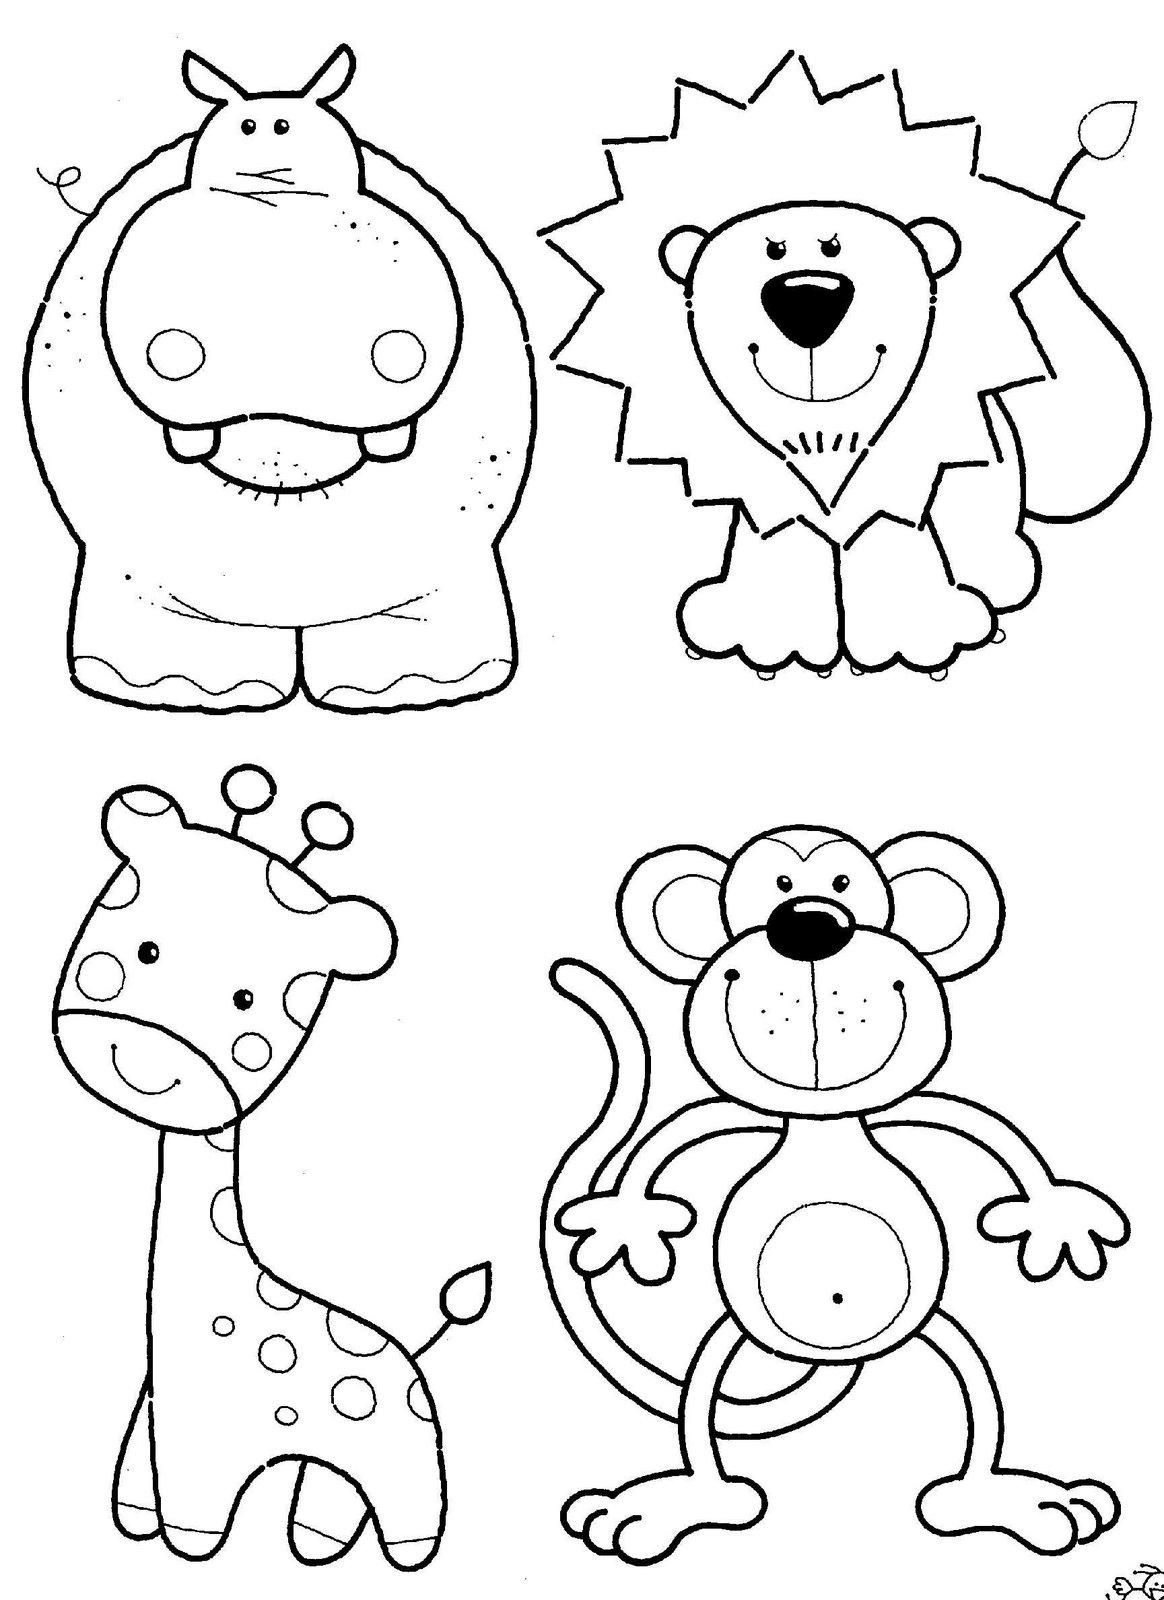 colouring baby animals 35 baby farm animals coloring pages all baby farm animal animals baby colouring